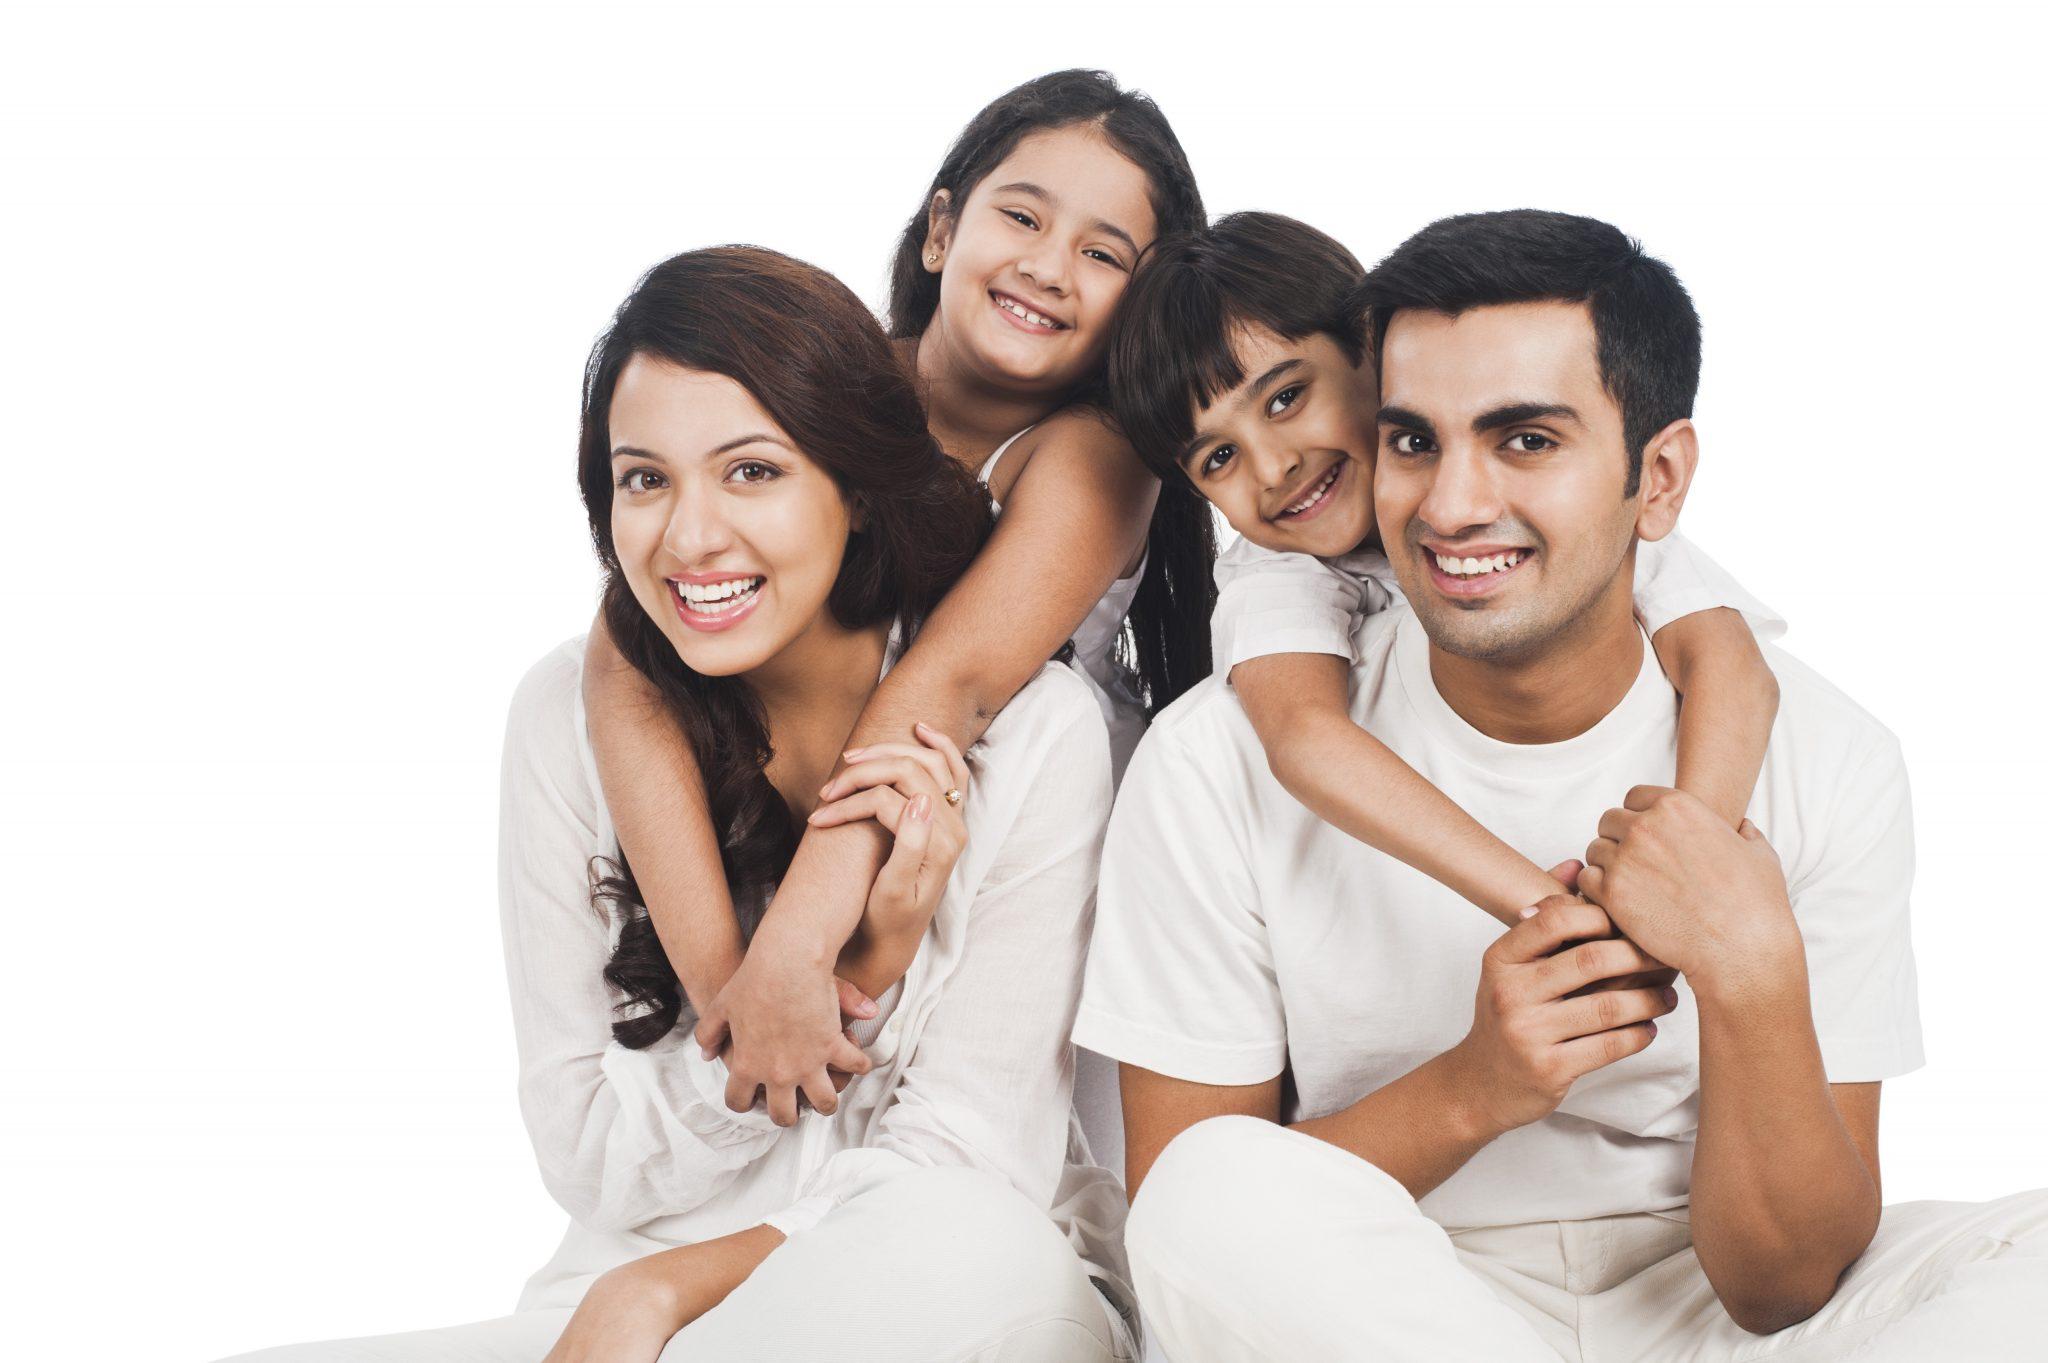 Malton Family Dental - Mississauga